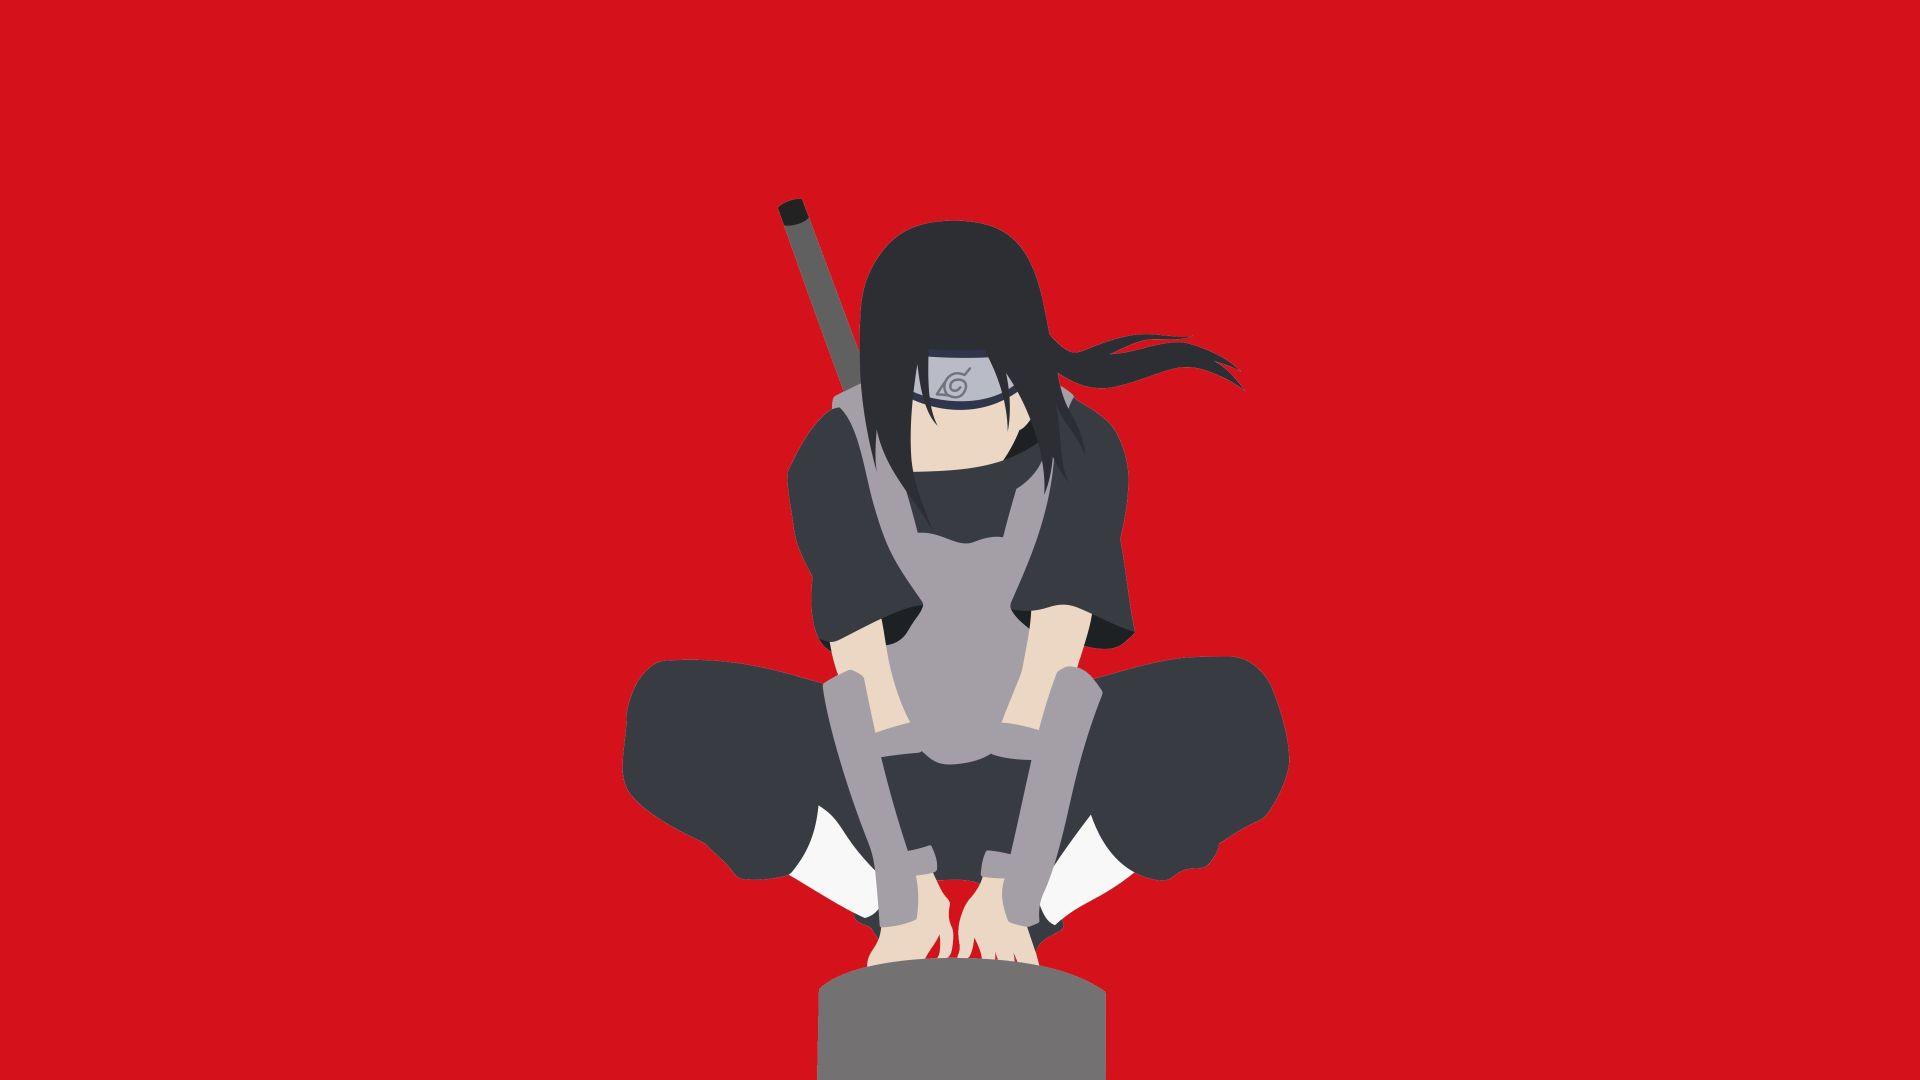 Naruto Minimalist, Wallpaper Theme